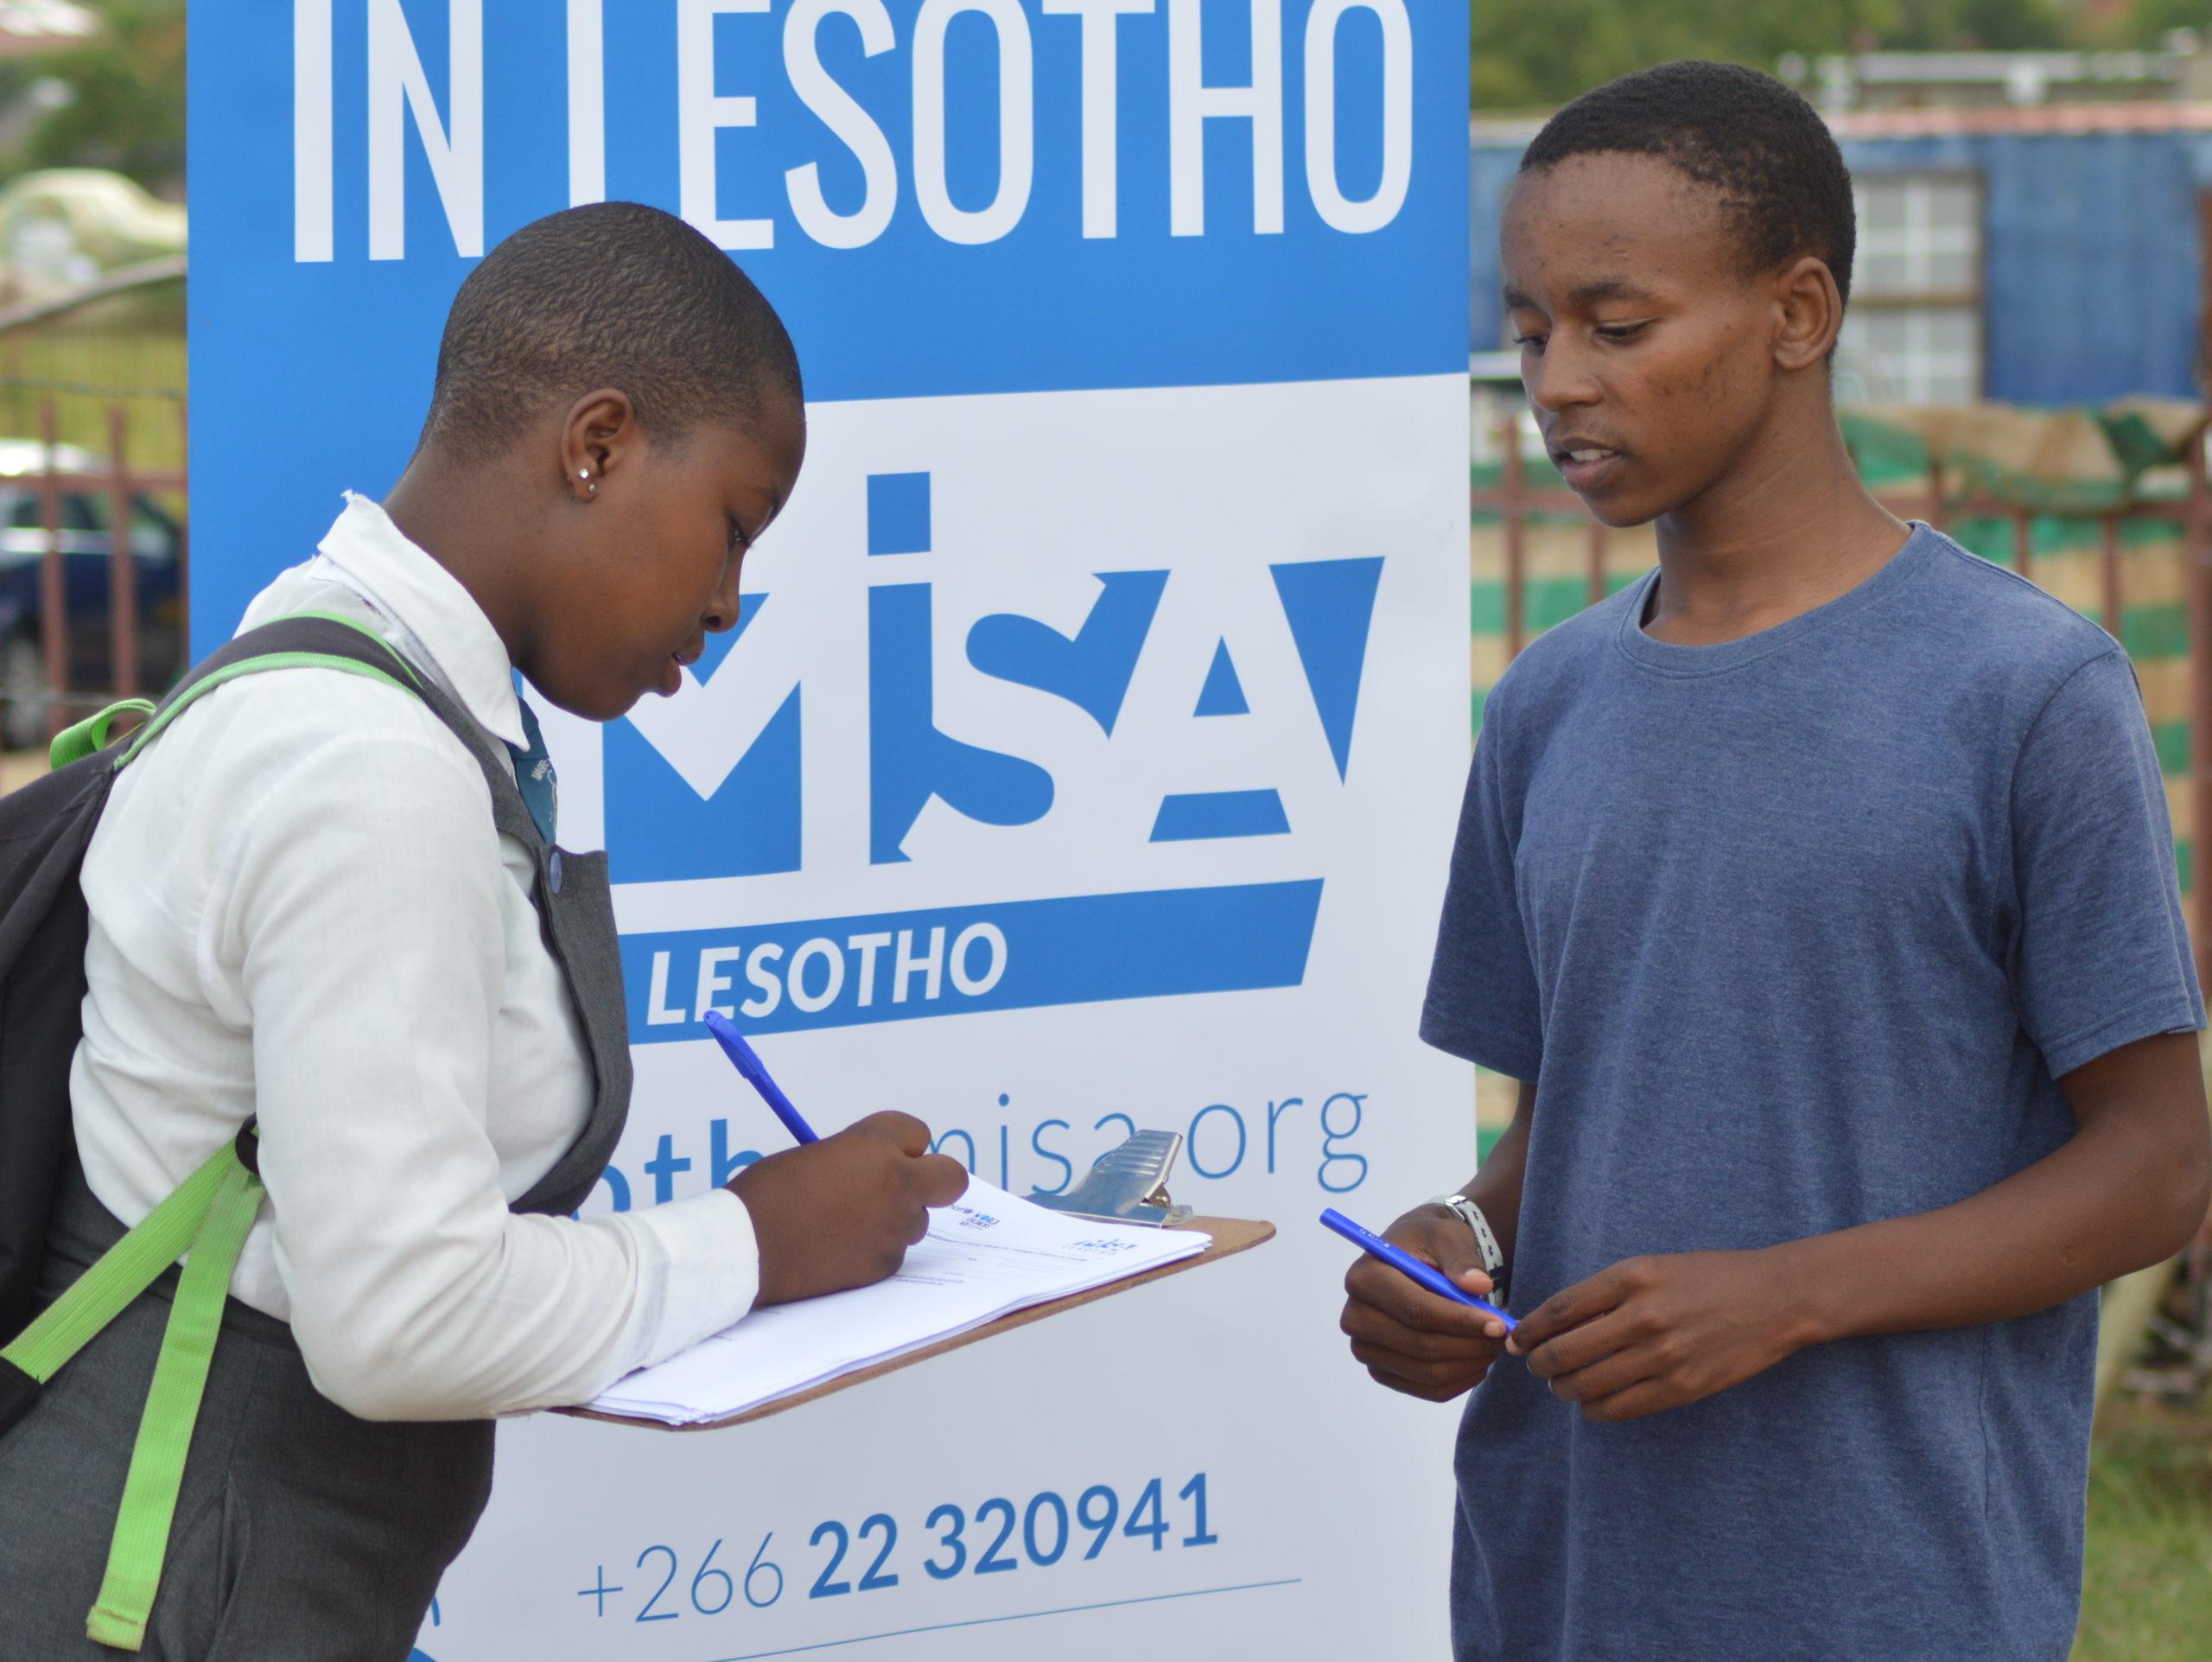 Survey on Children's Use of Social Media in Lesotho